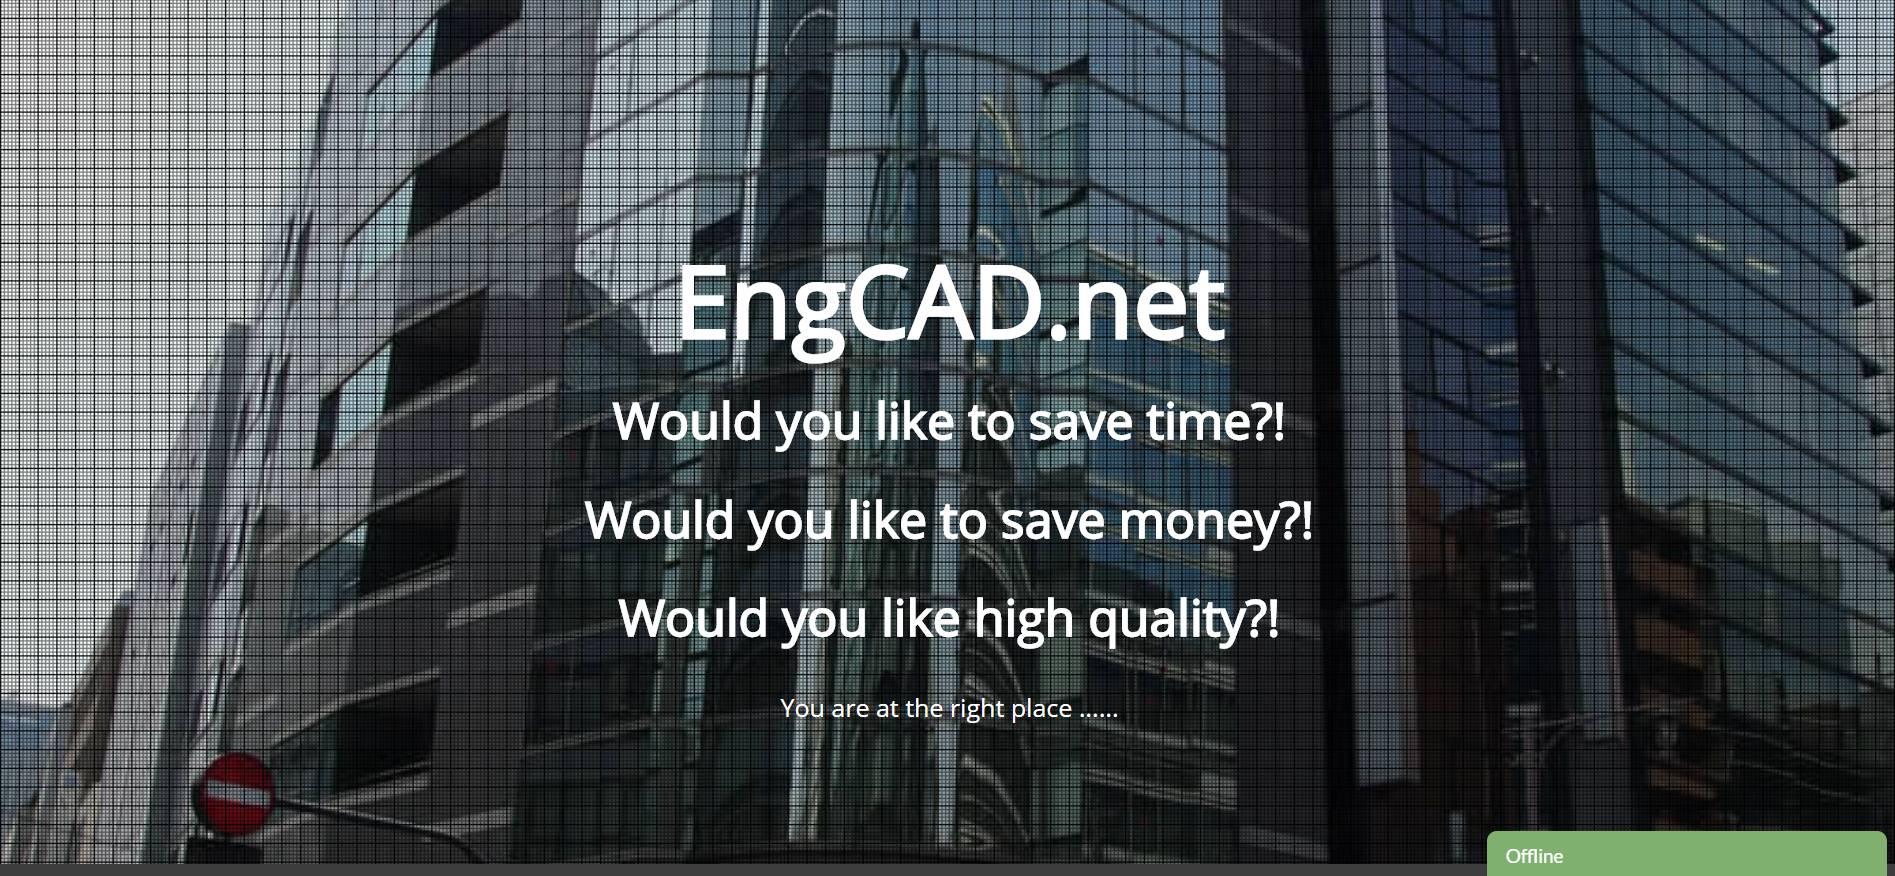 EngCAD.net